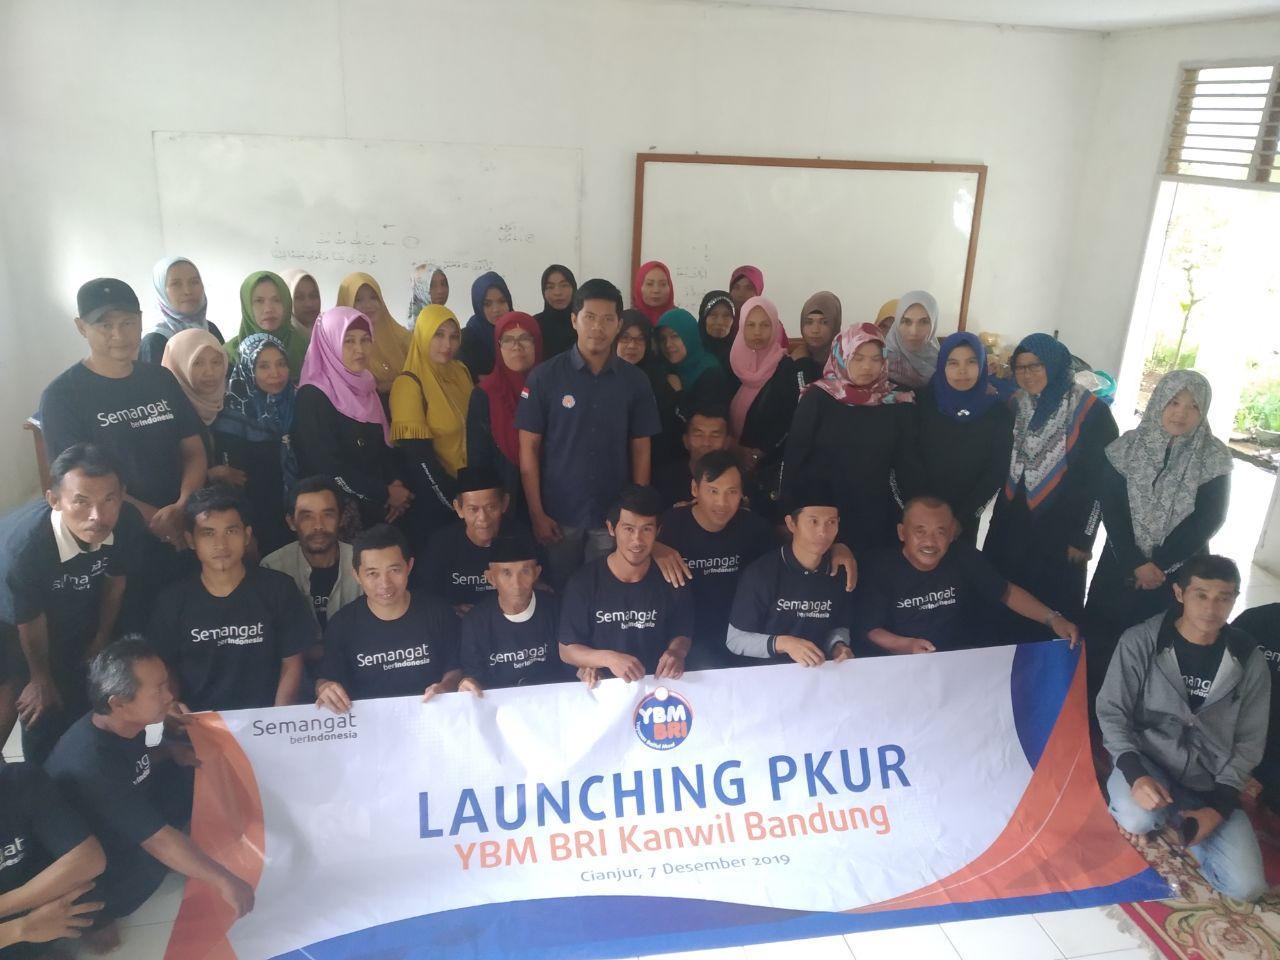 Launching PKUR Cianjur